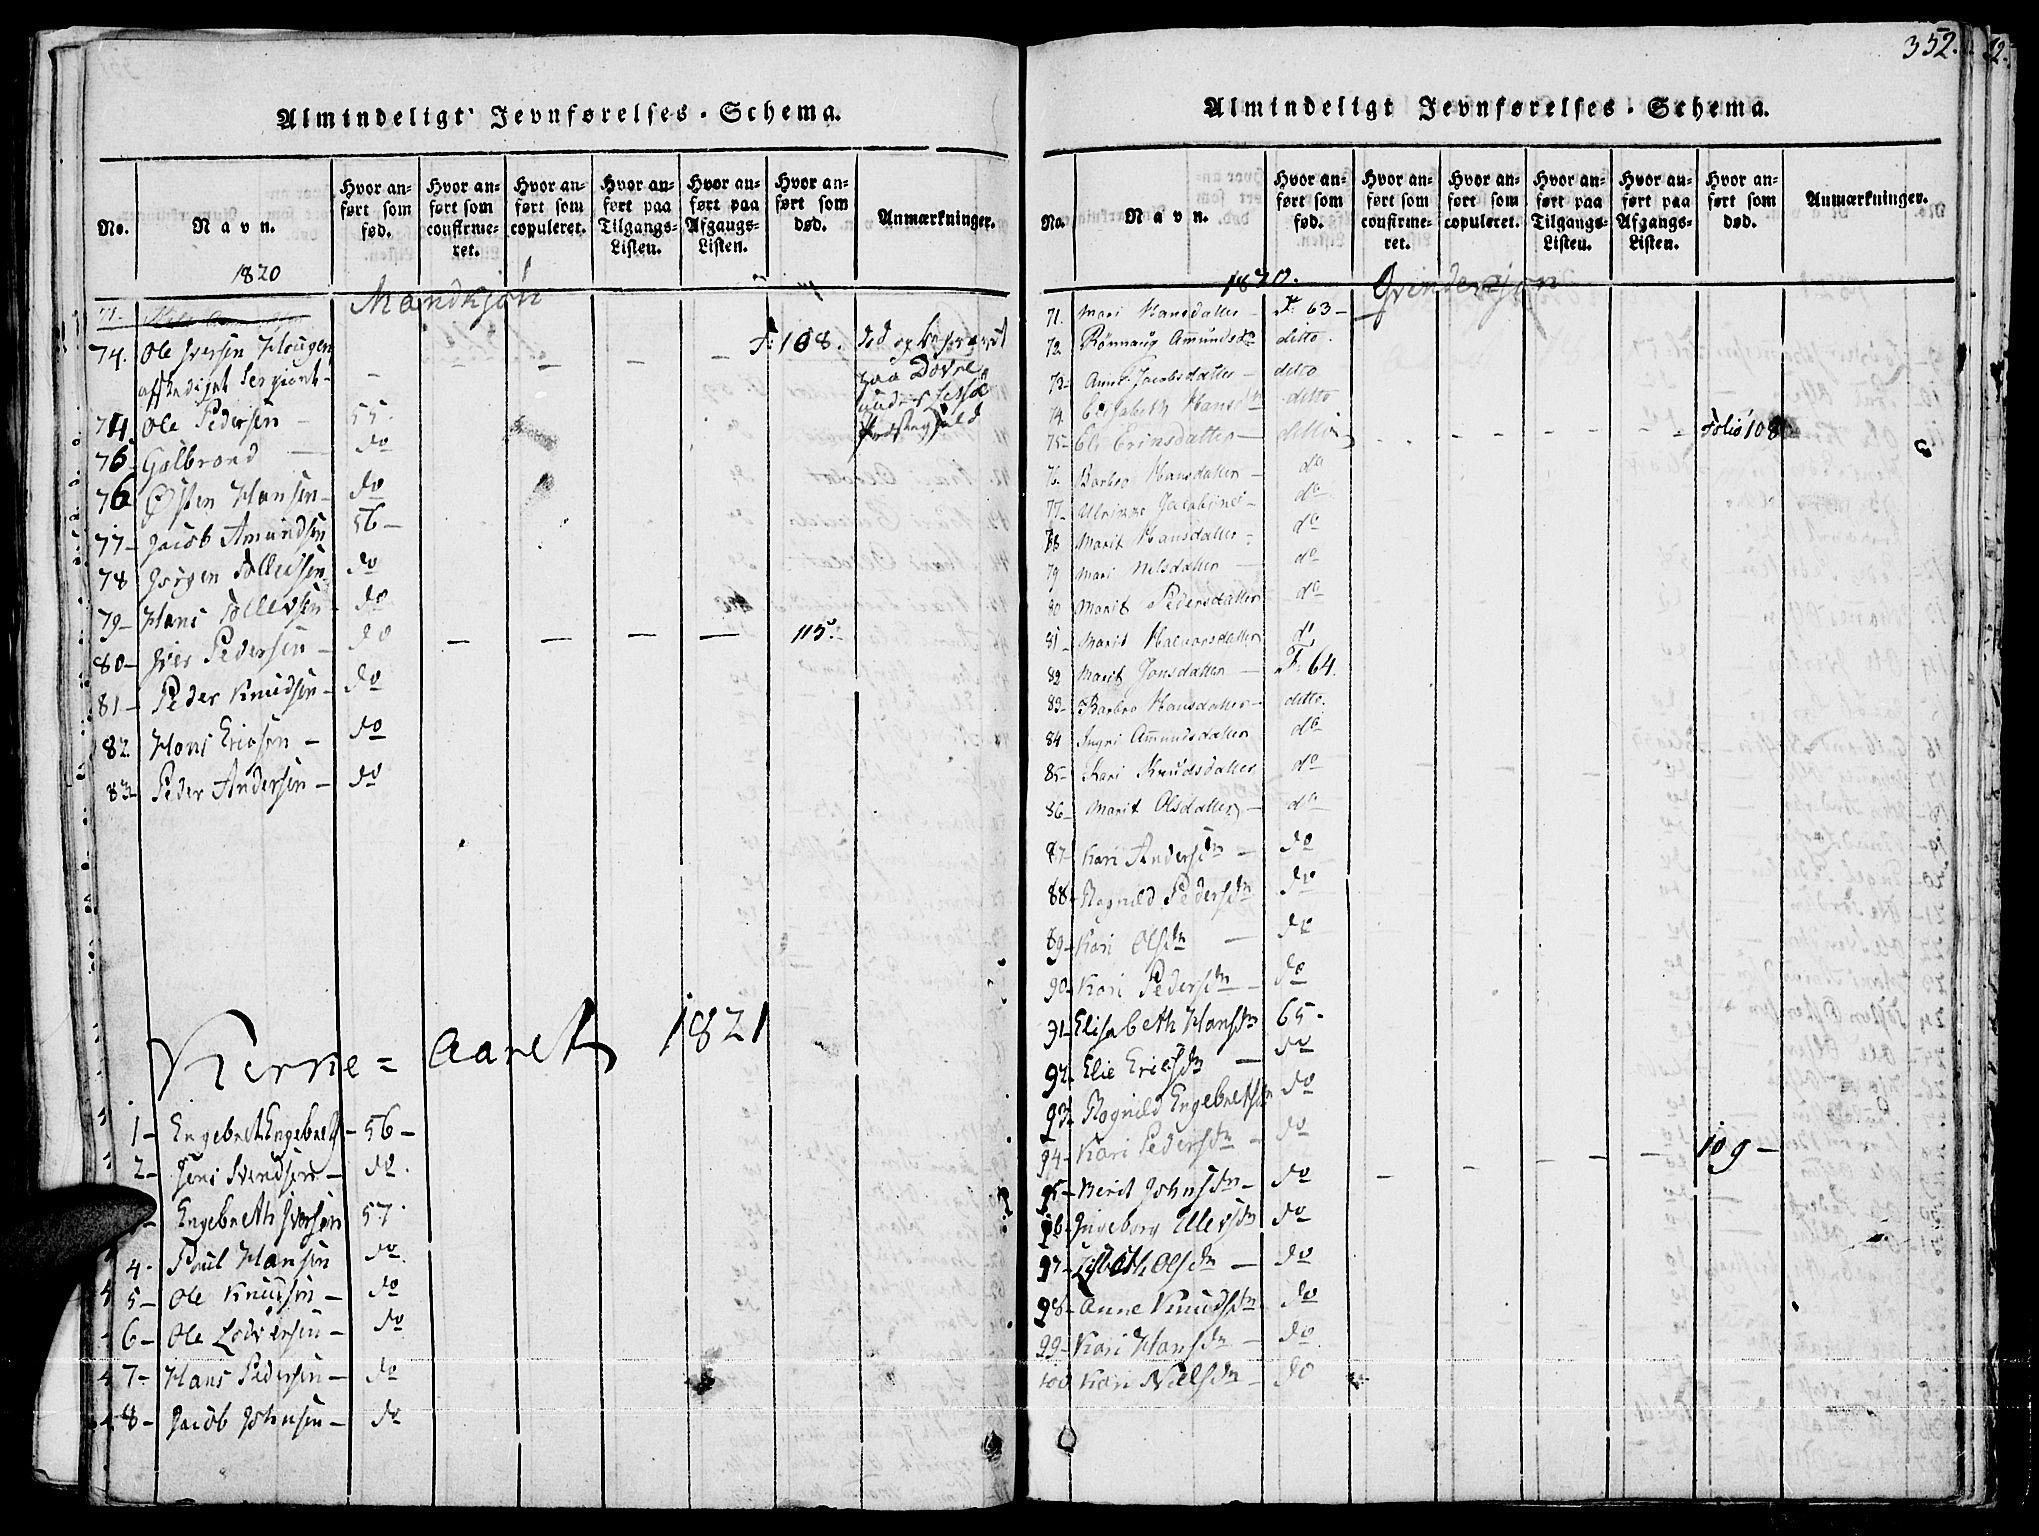 SAH, Fron prestekontor, H/Ha/Haa/L0002: Ministerialbok nr. 2, 1816-1827, s. 352